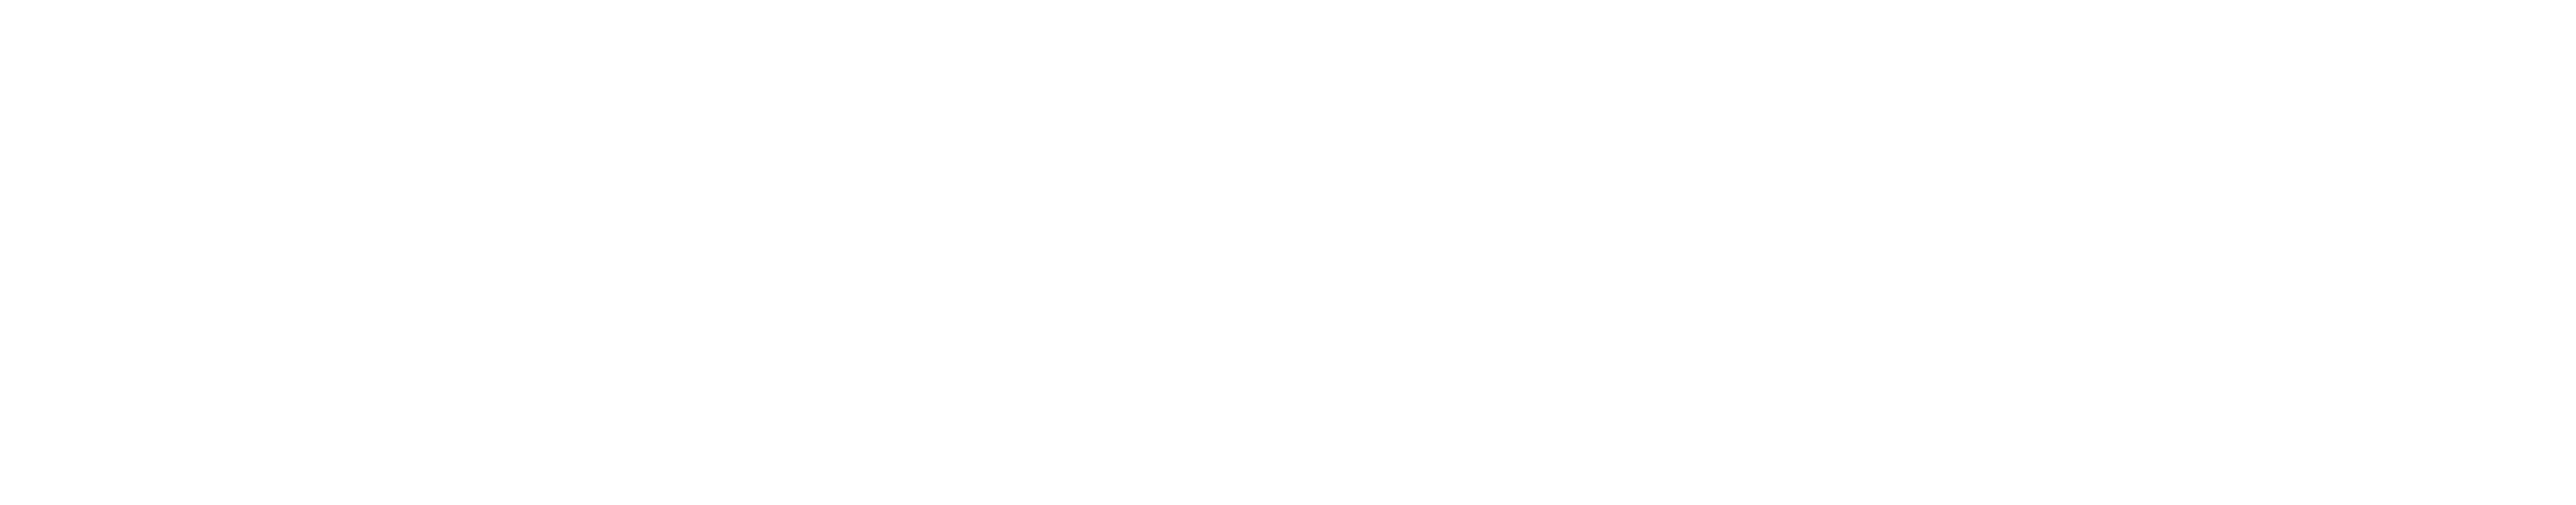 NPR Training